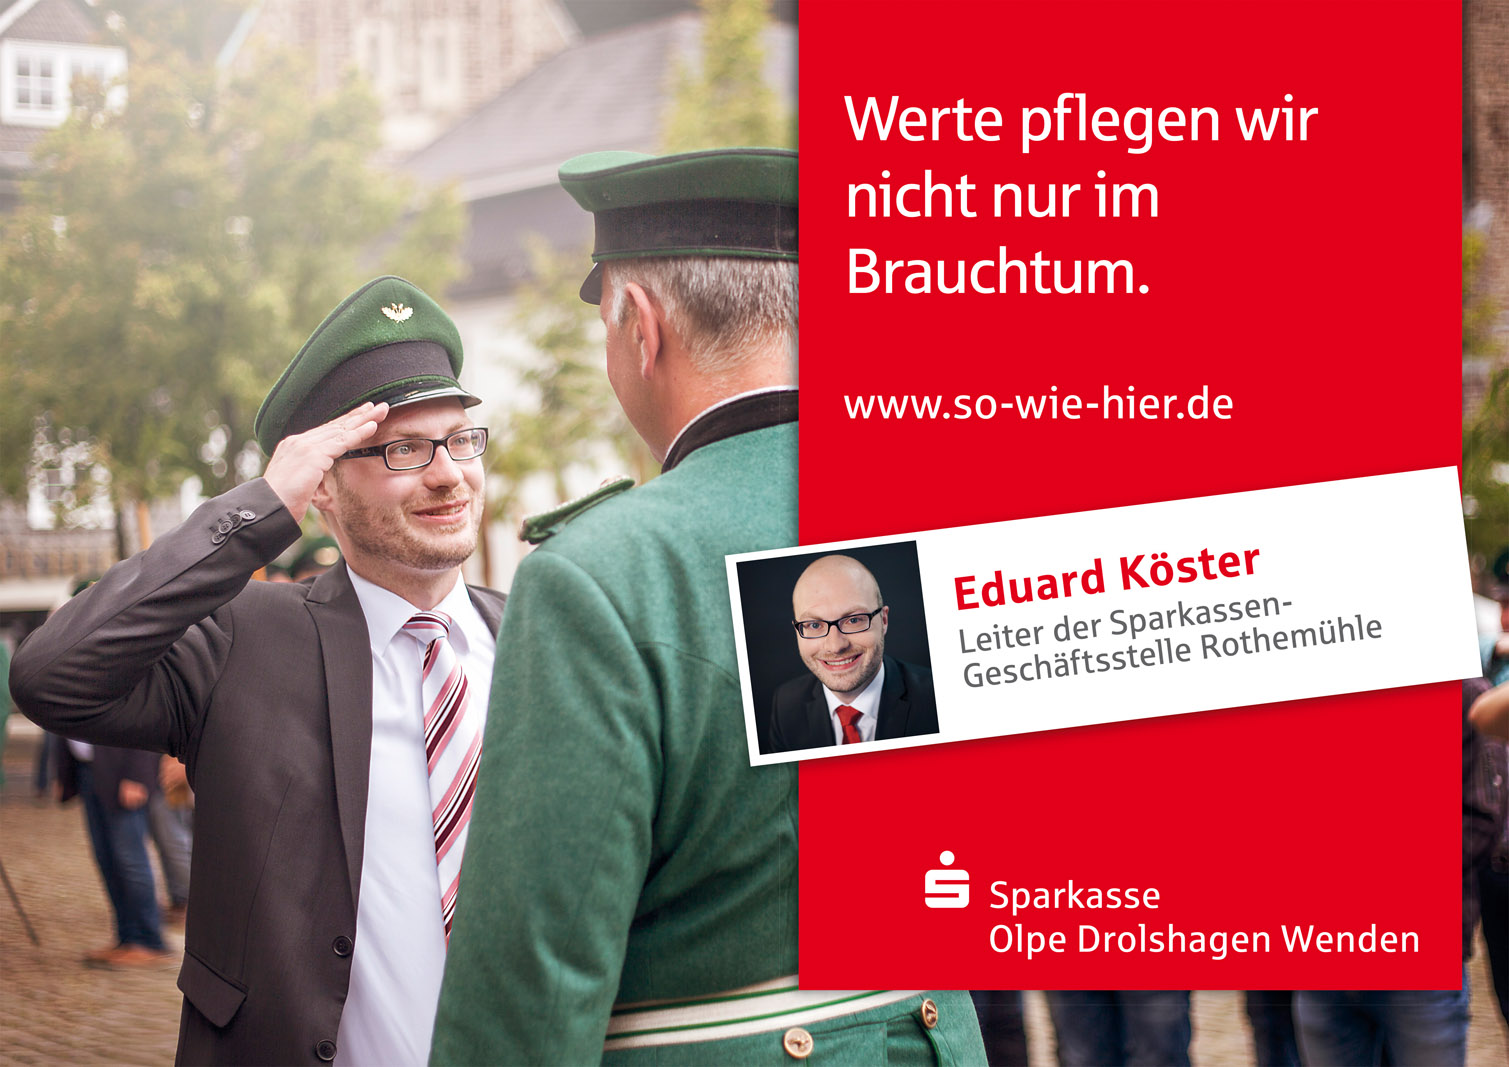 kampagne-sparkasse-olpe-drolshagen-wenden007